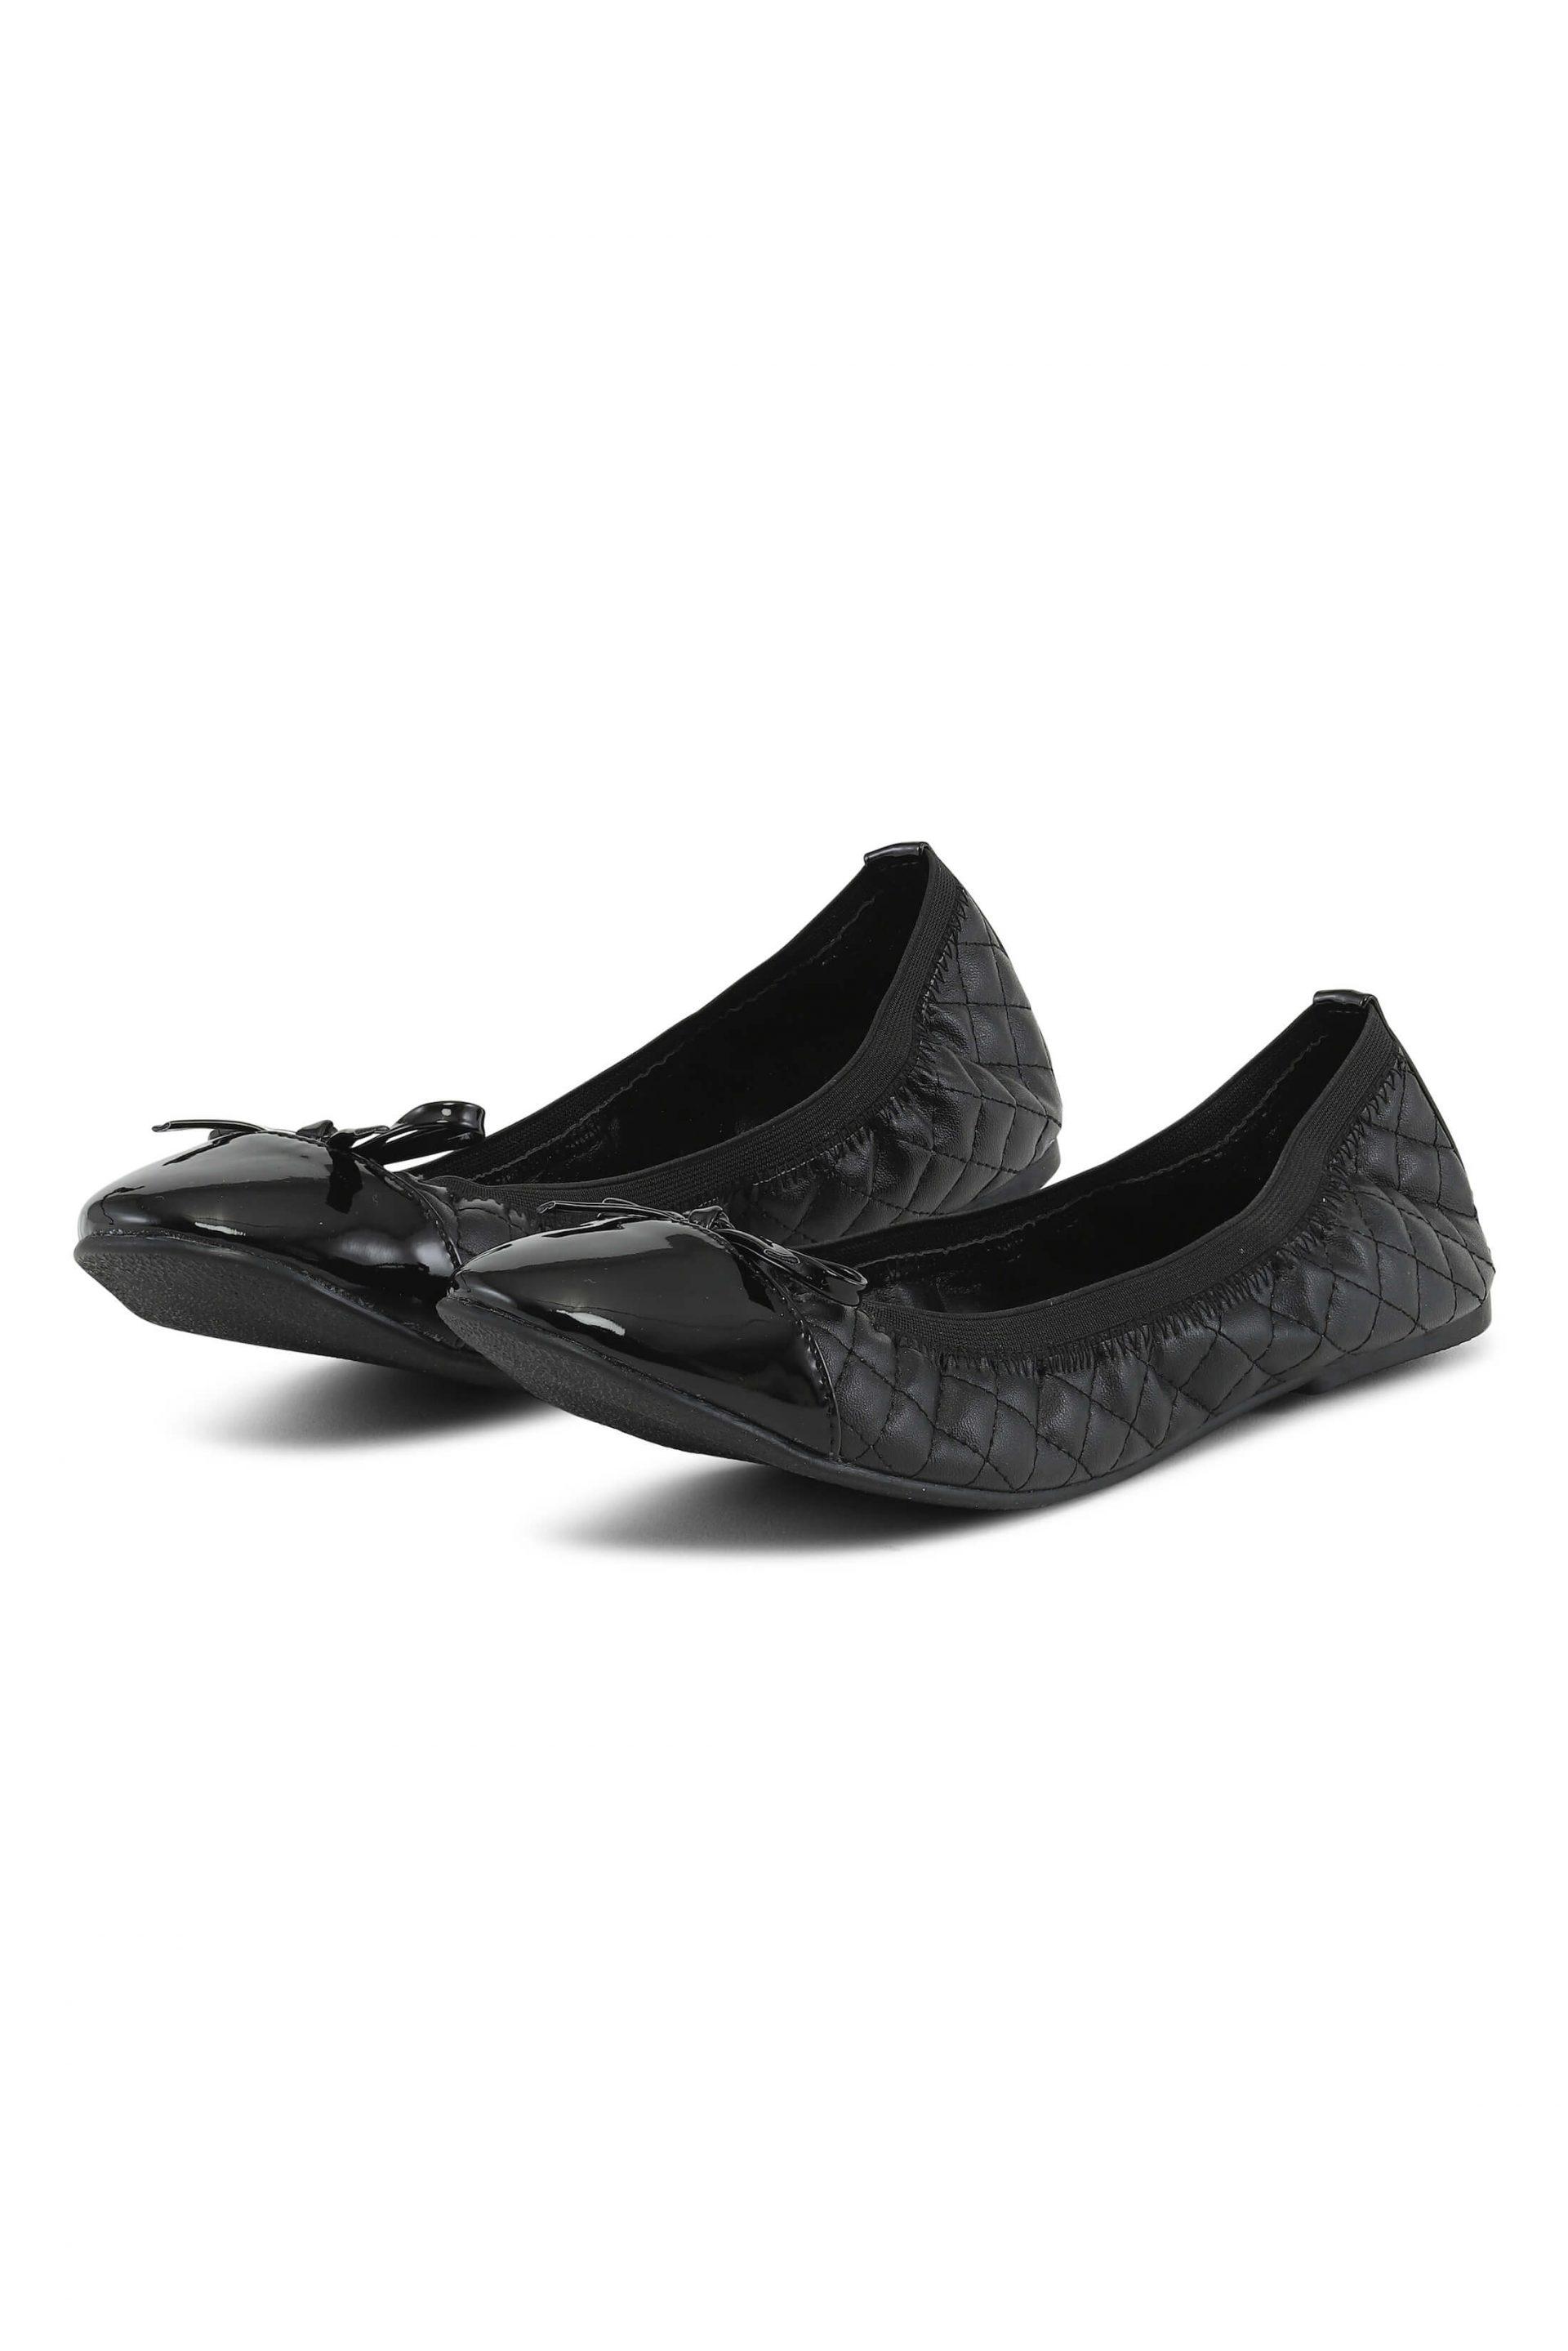 Black ballerinas with quiltet details